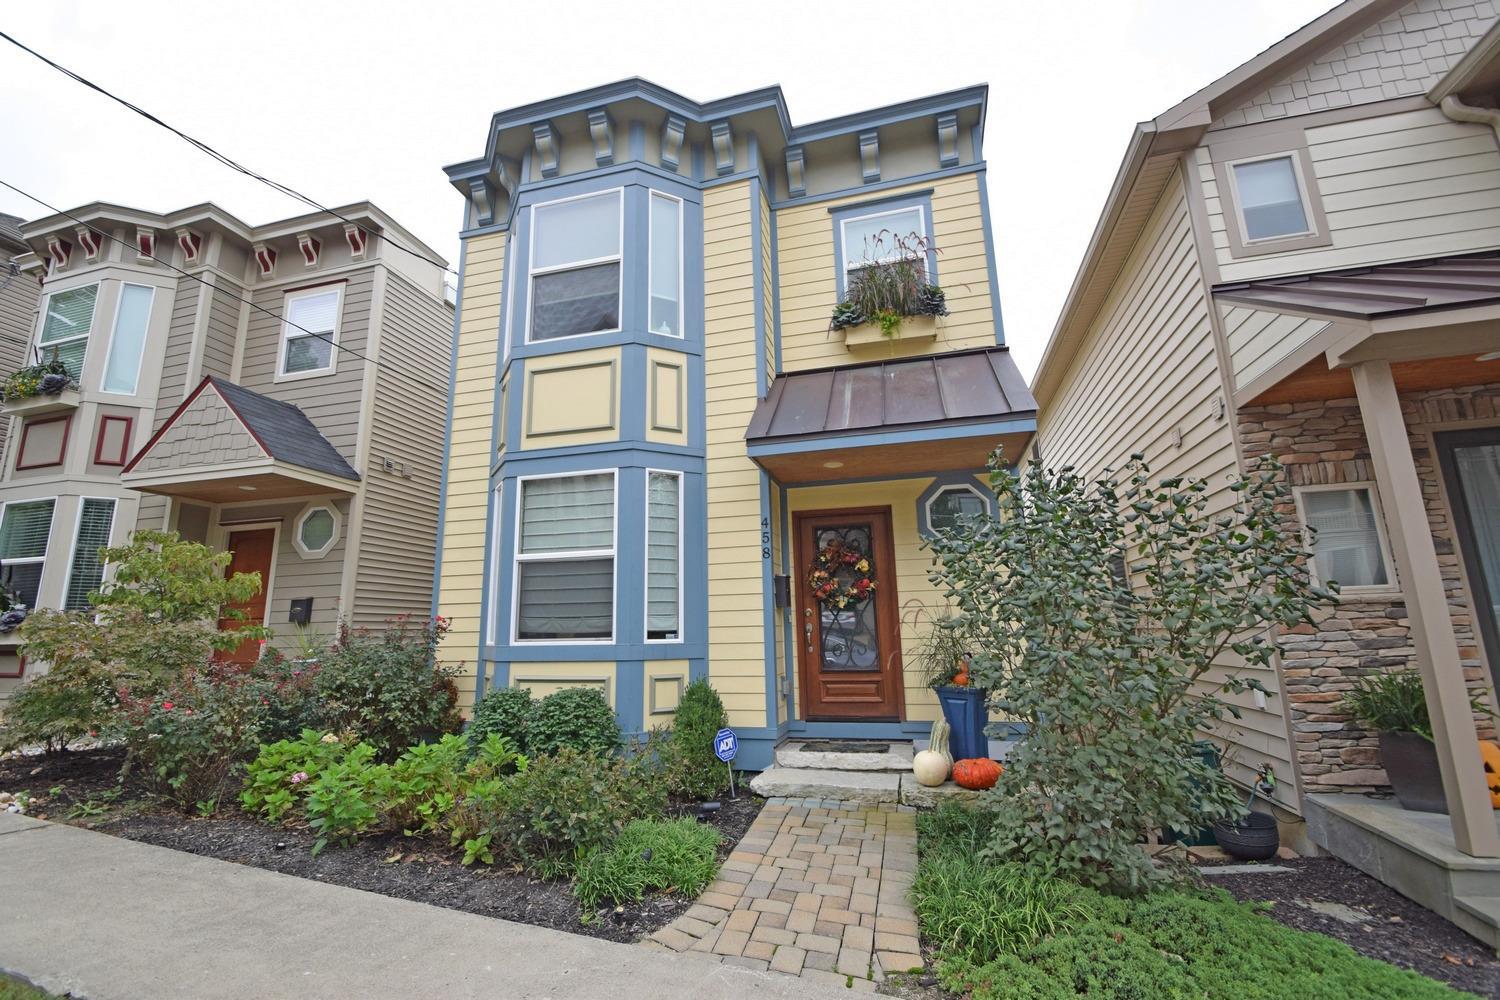 Property for sale at 458 Strafer Street, Cincinnati,  OH 45226